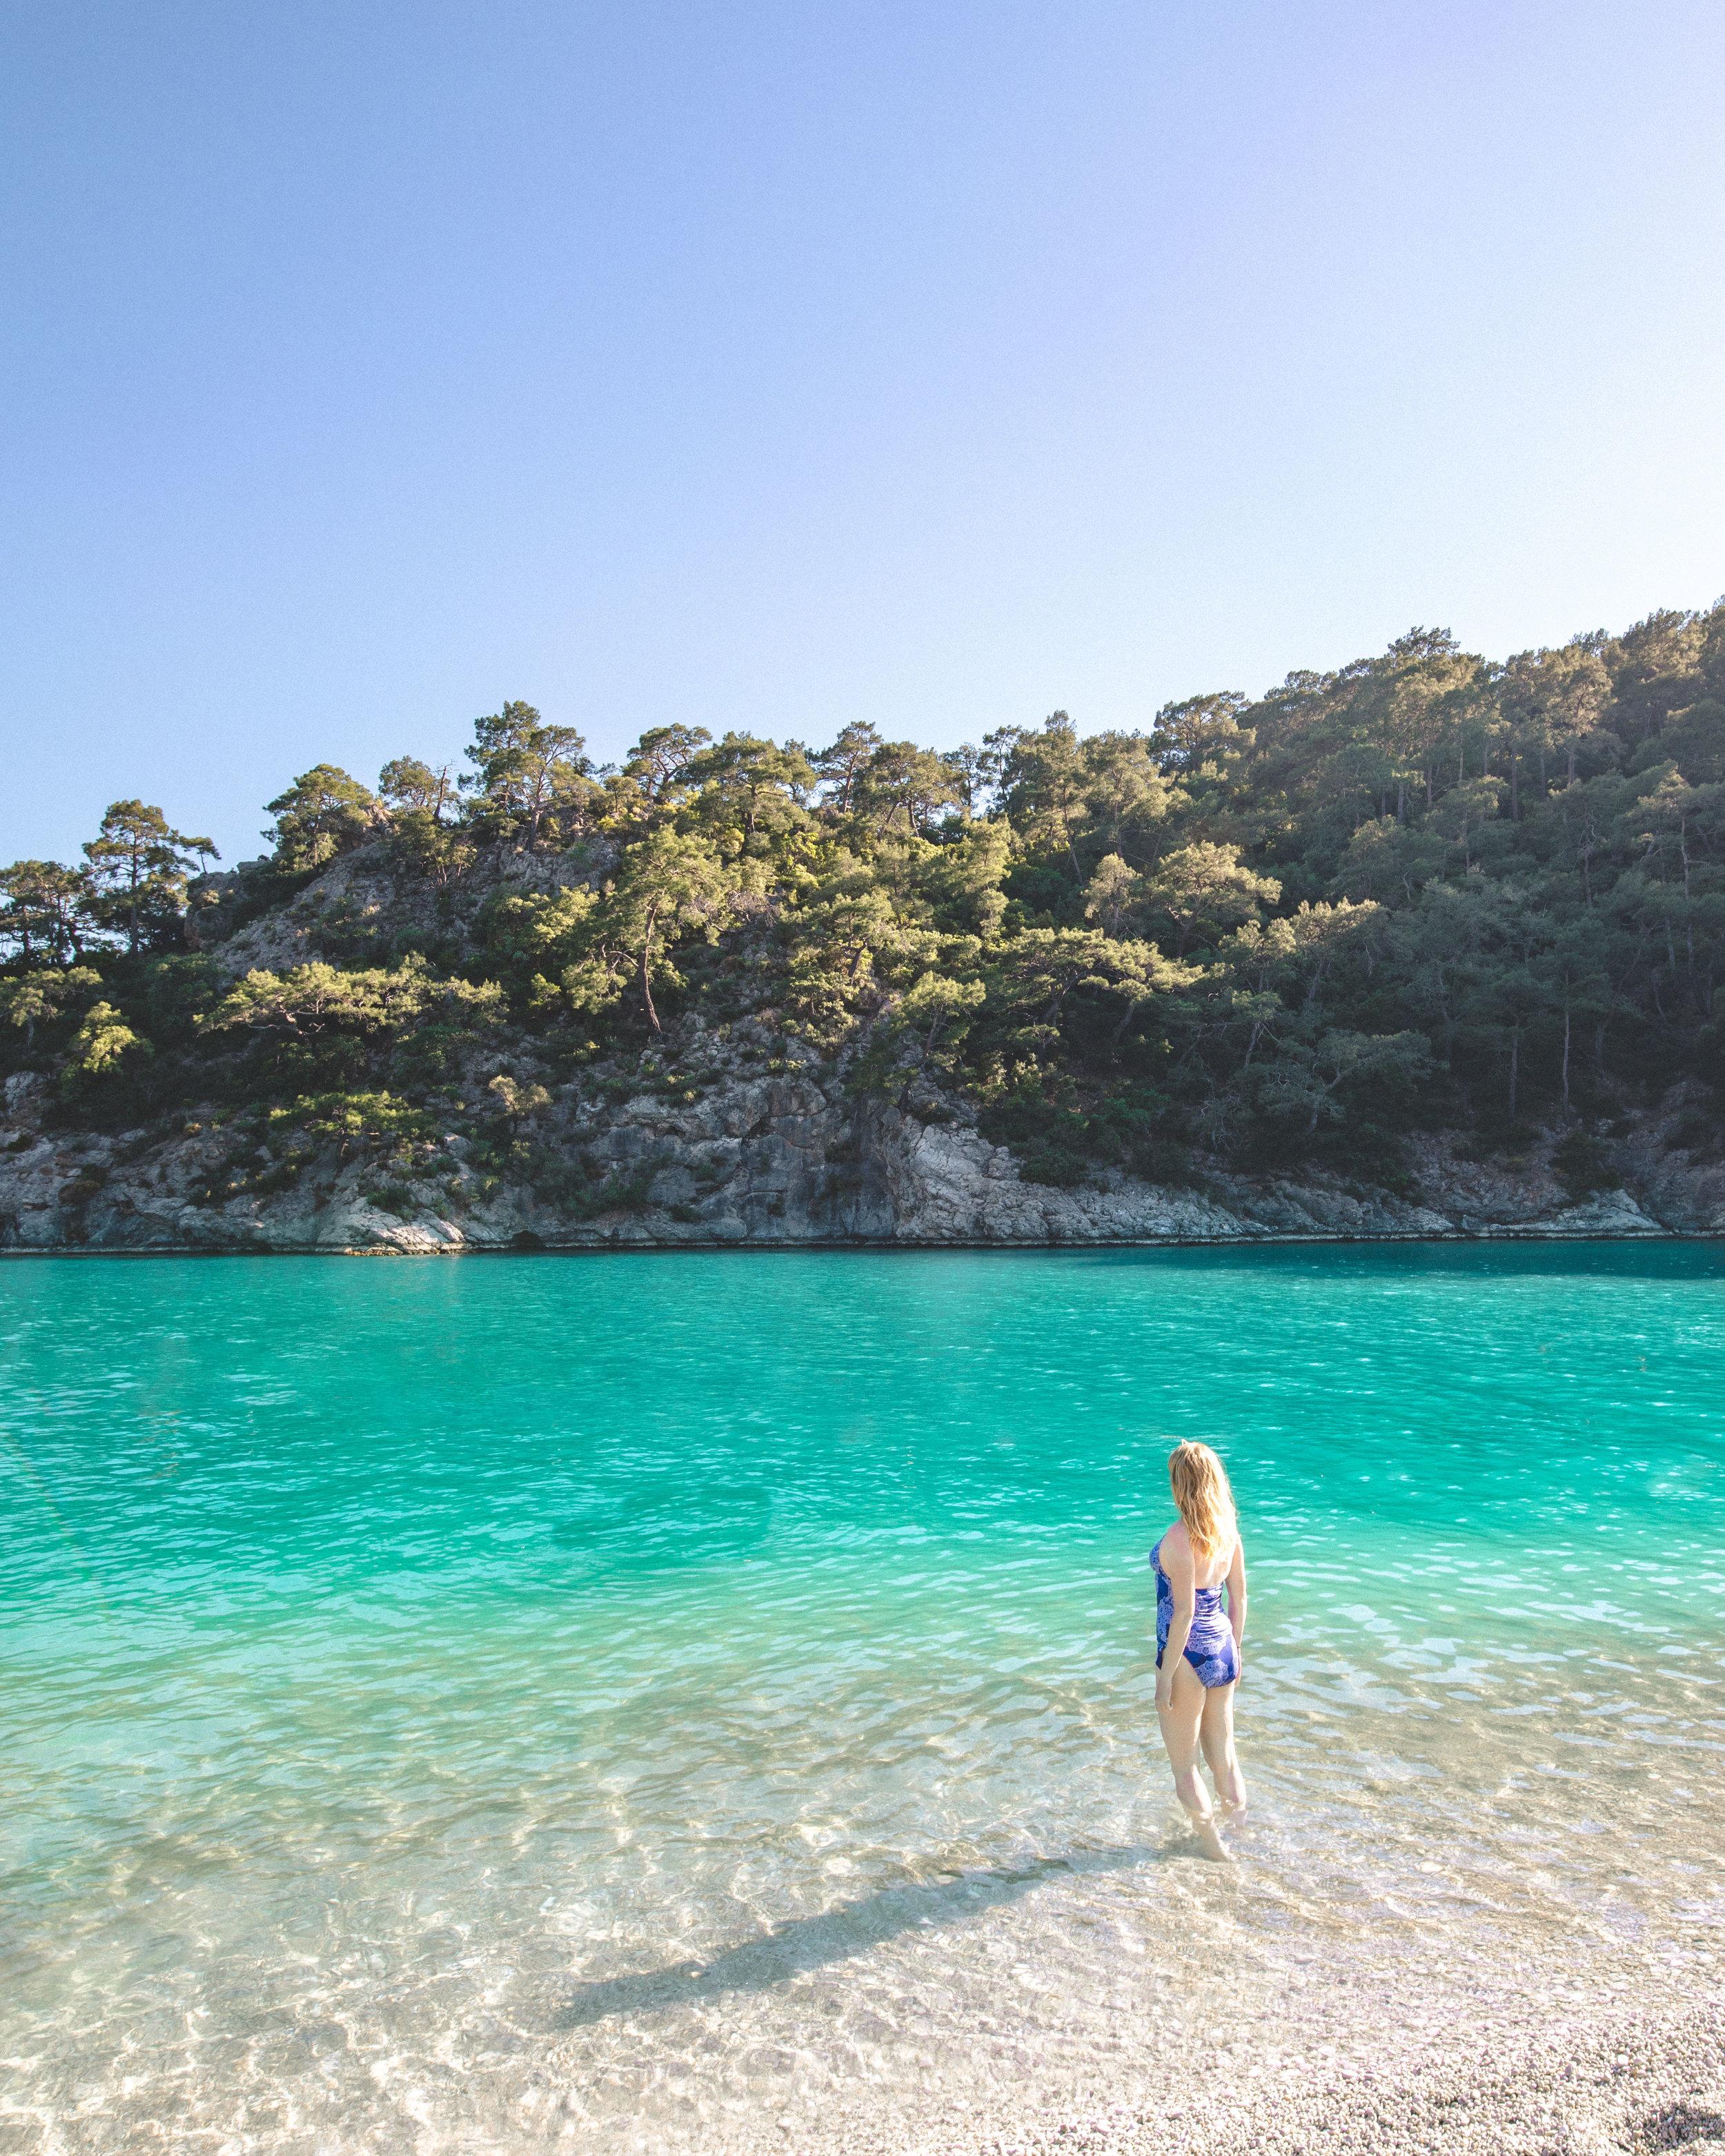 Blue Lagoon in Olu Deniz - Instagram worthy places in Turkey